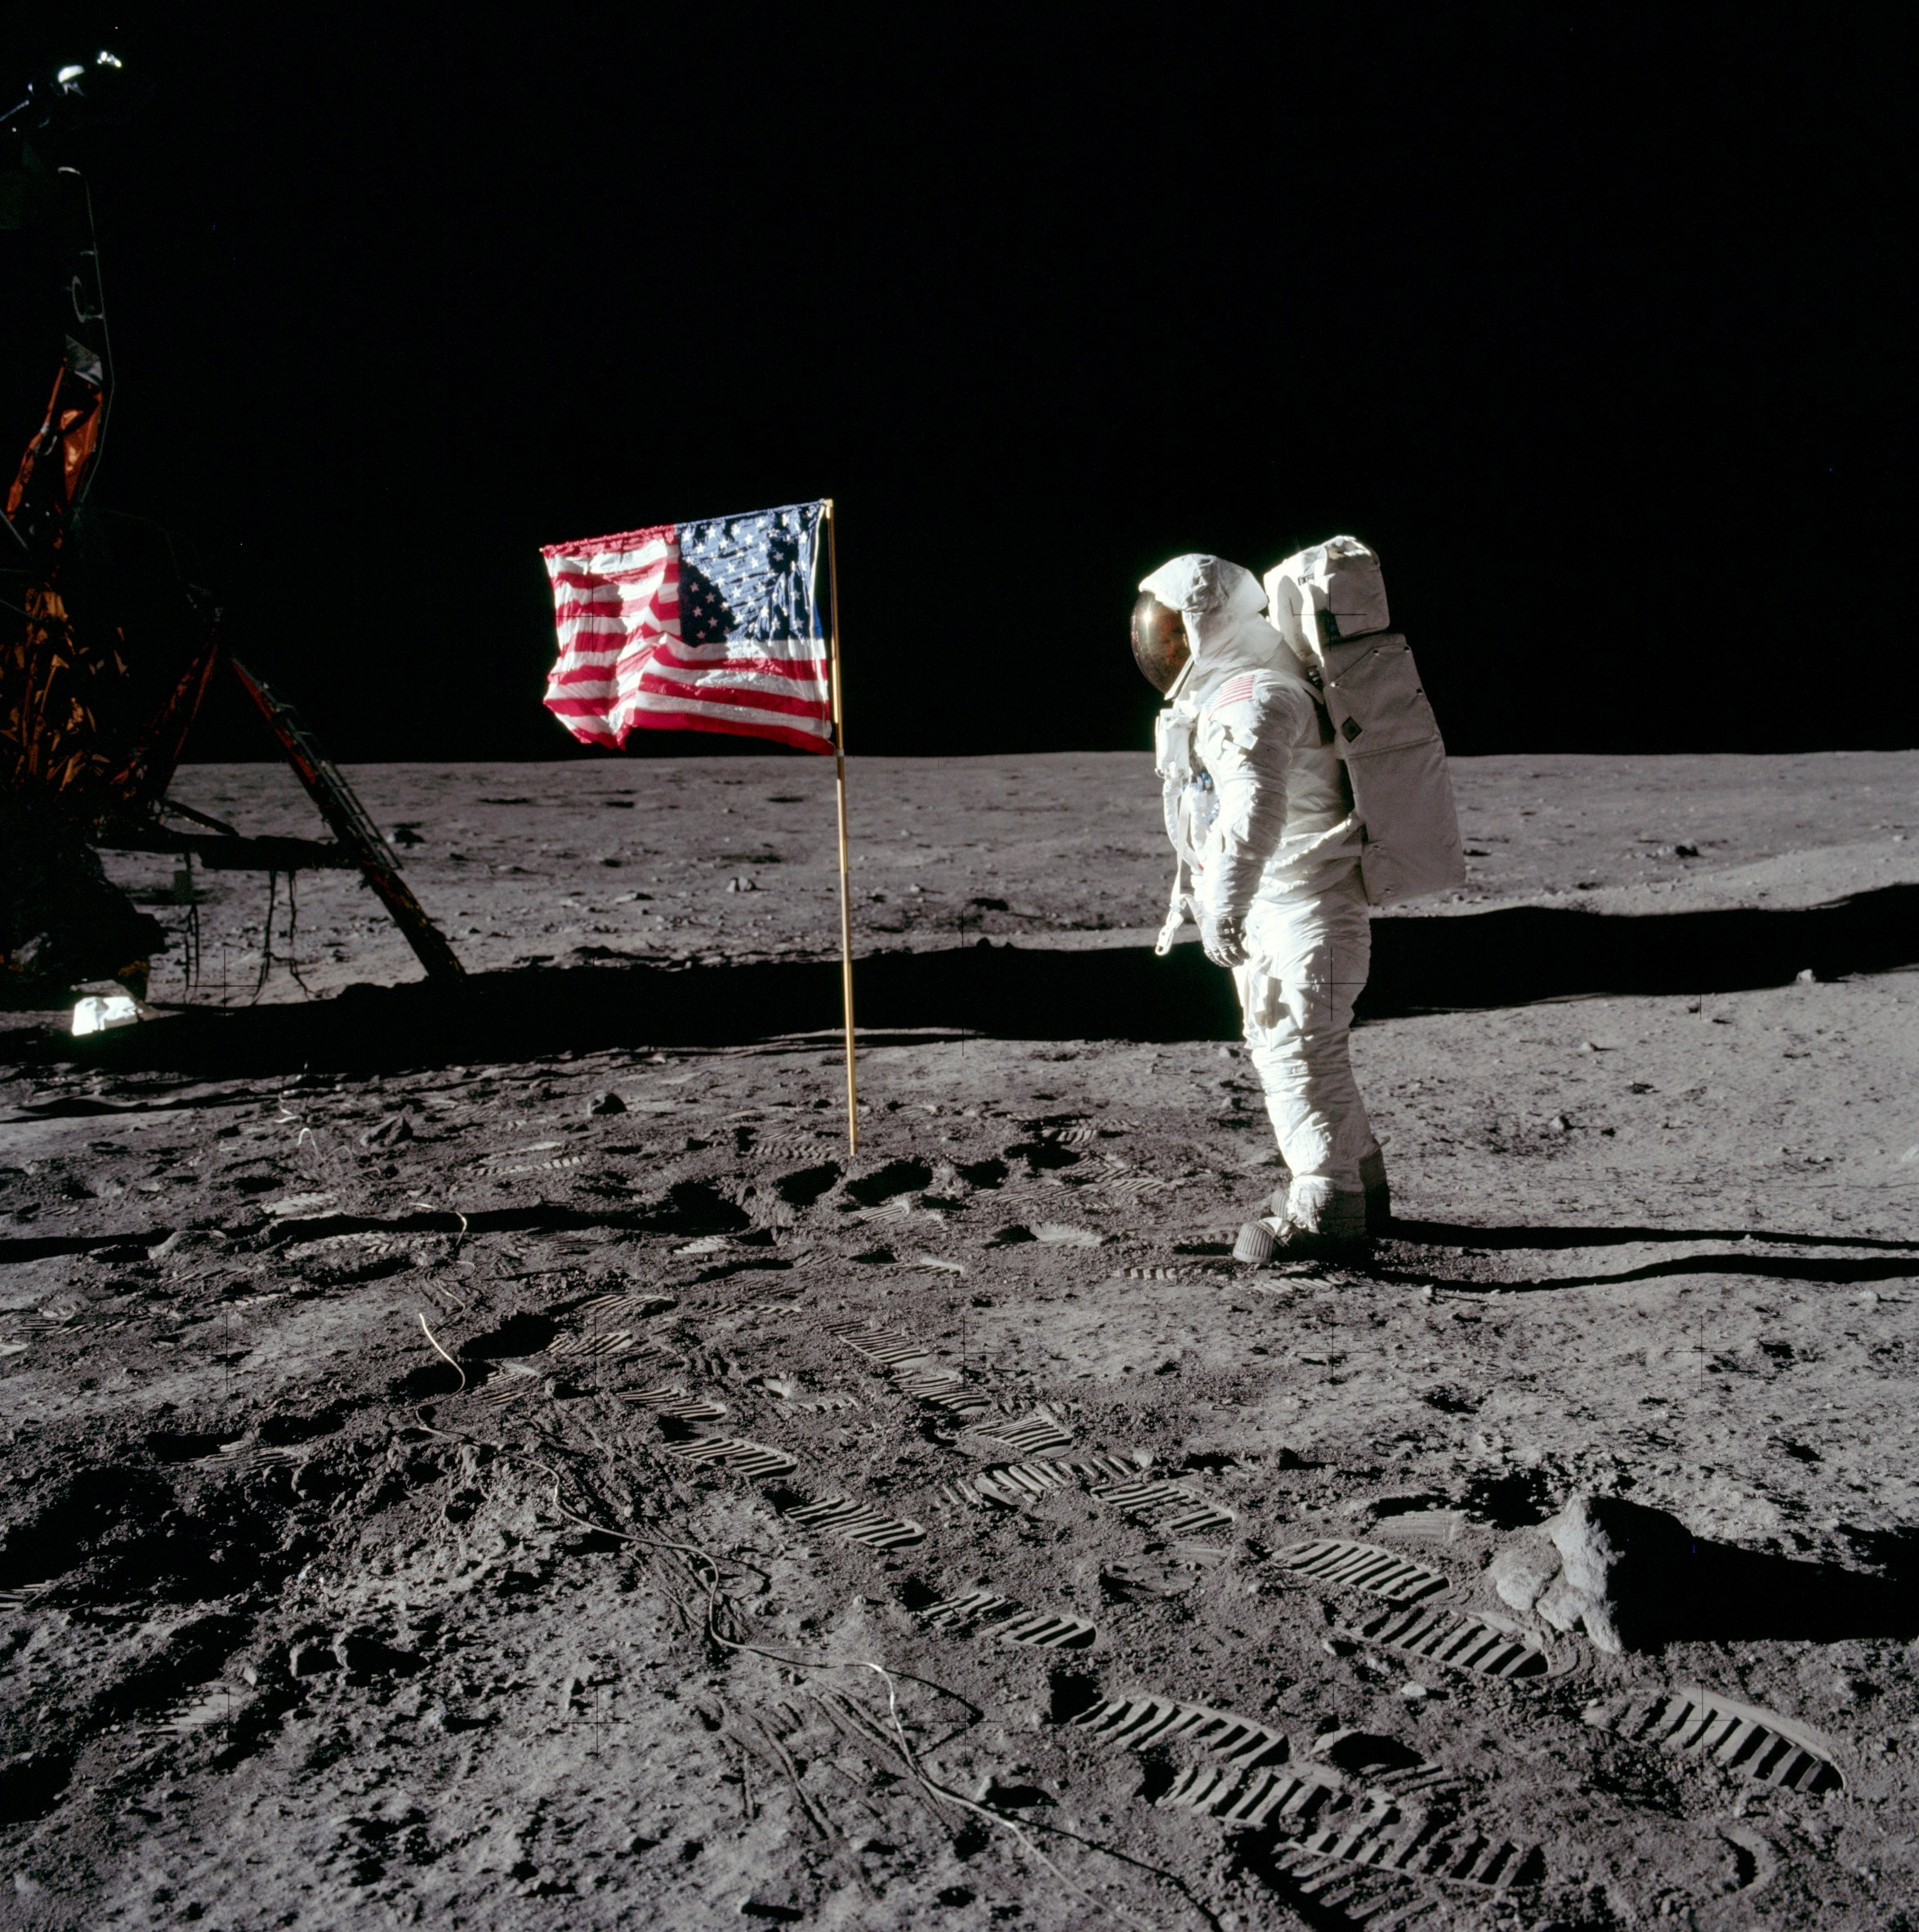 gp_drapeau-us-lune-apollo11.jpg